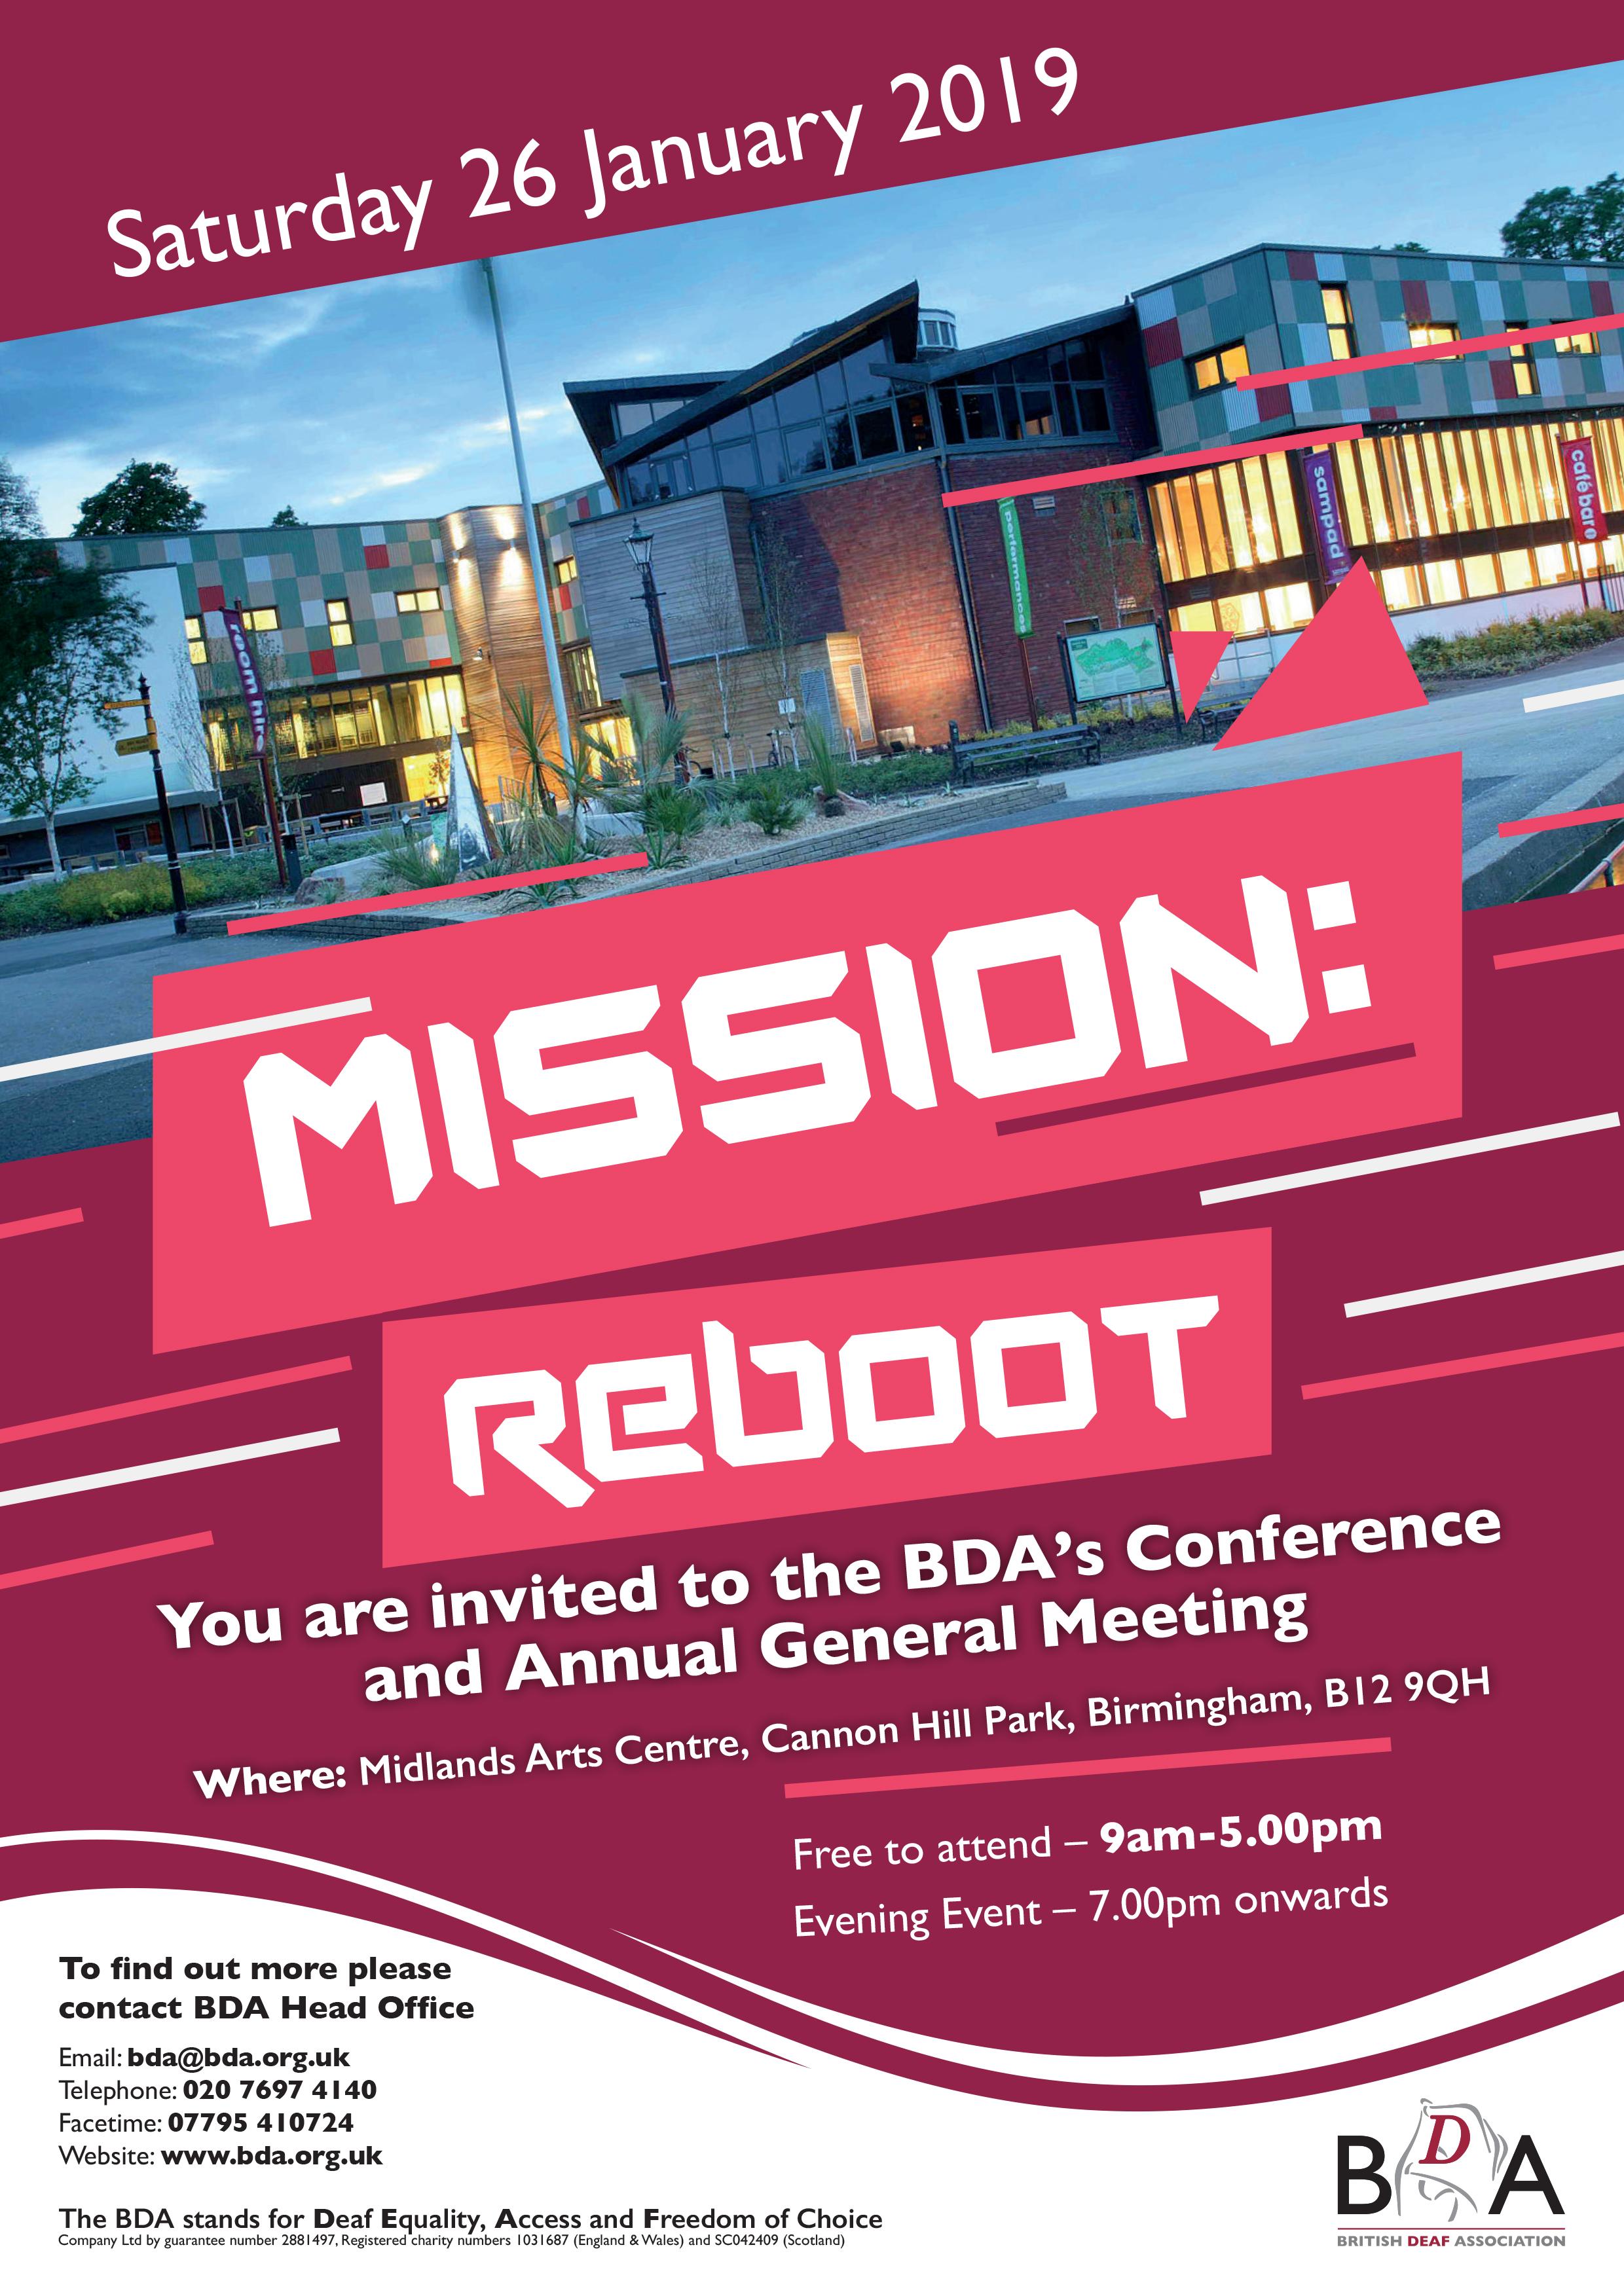 Mission: Reboot - BDA AGM 2019 - British Deaf Association